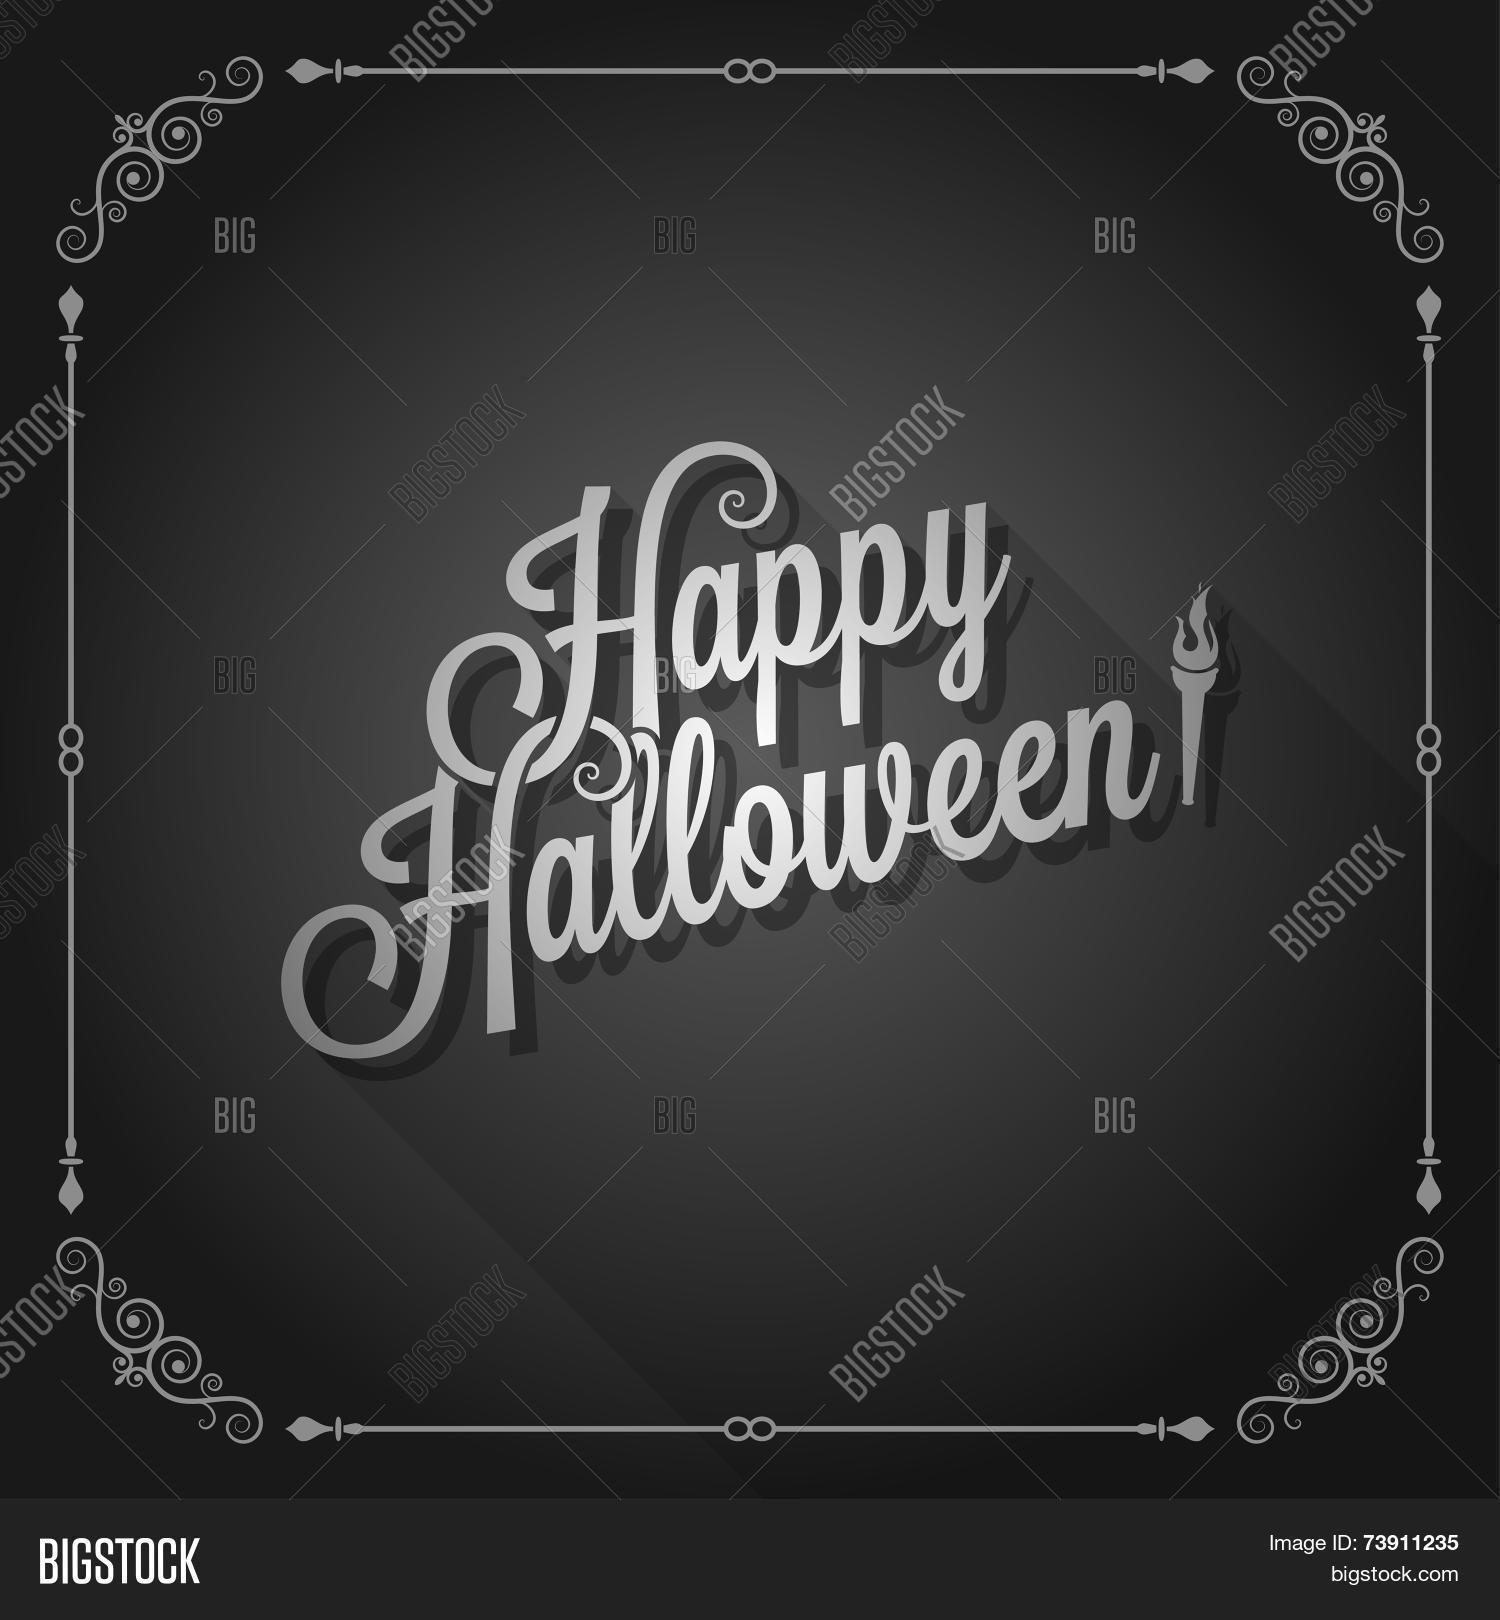 Halloween Movie Vector & Photo (Free Trial) | Bigstock